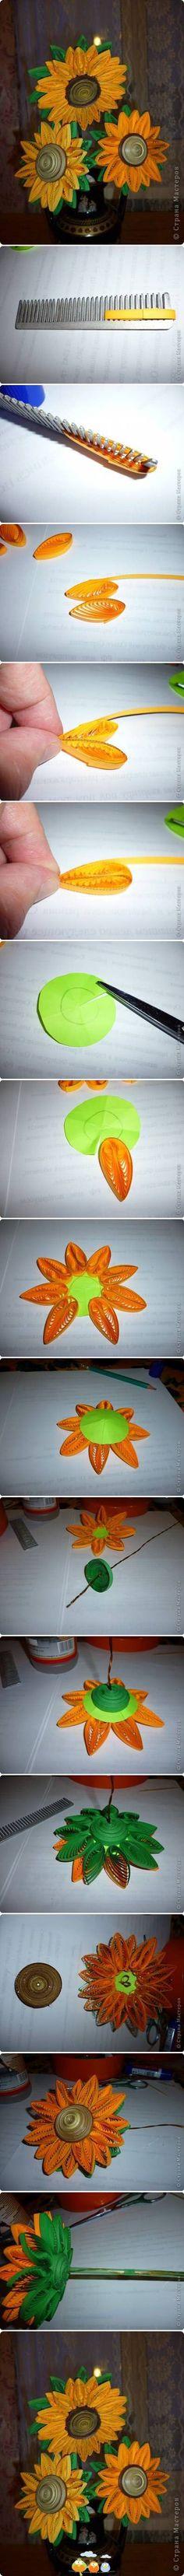 Sunflower quilling